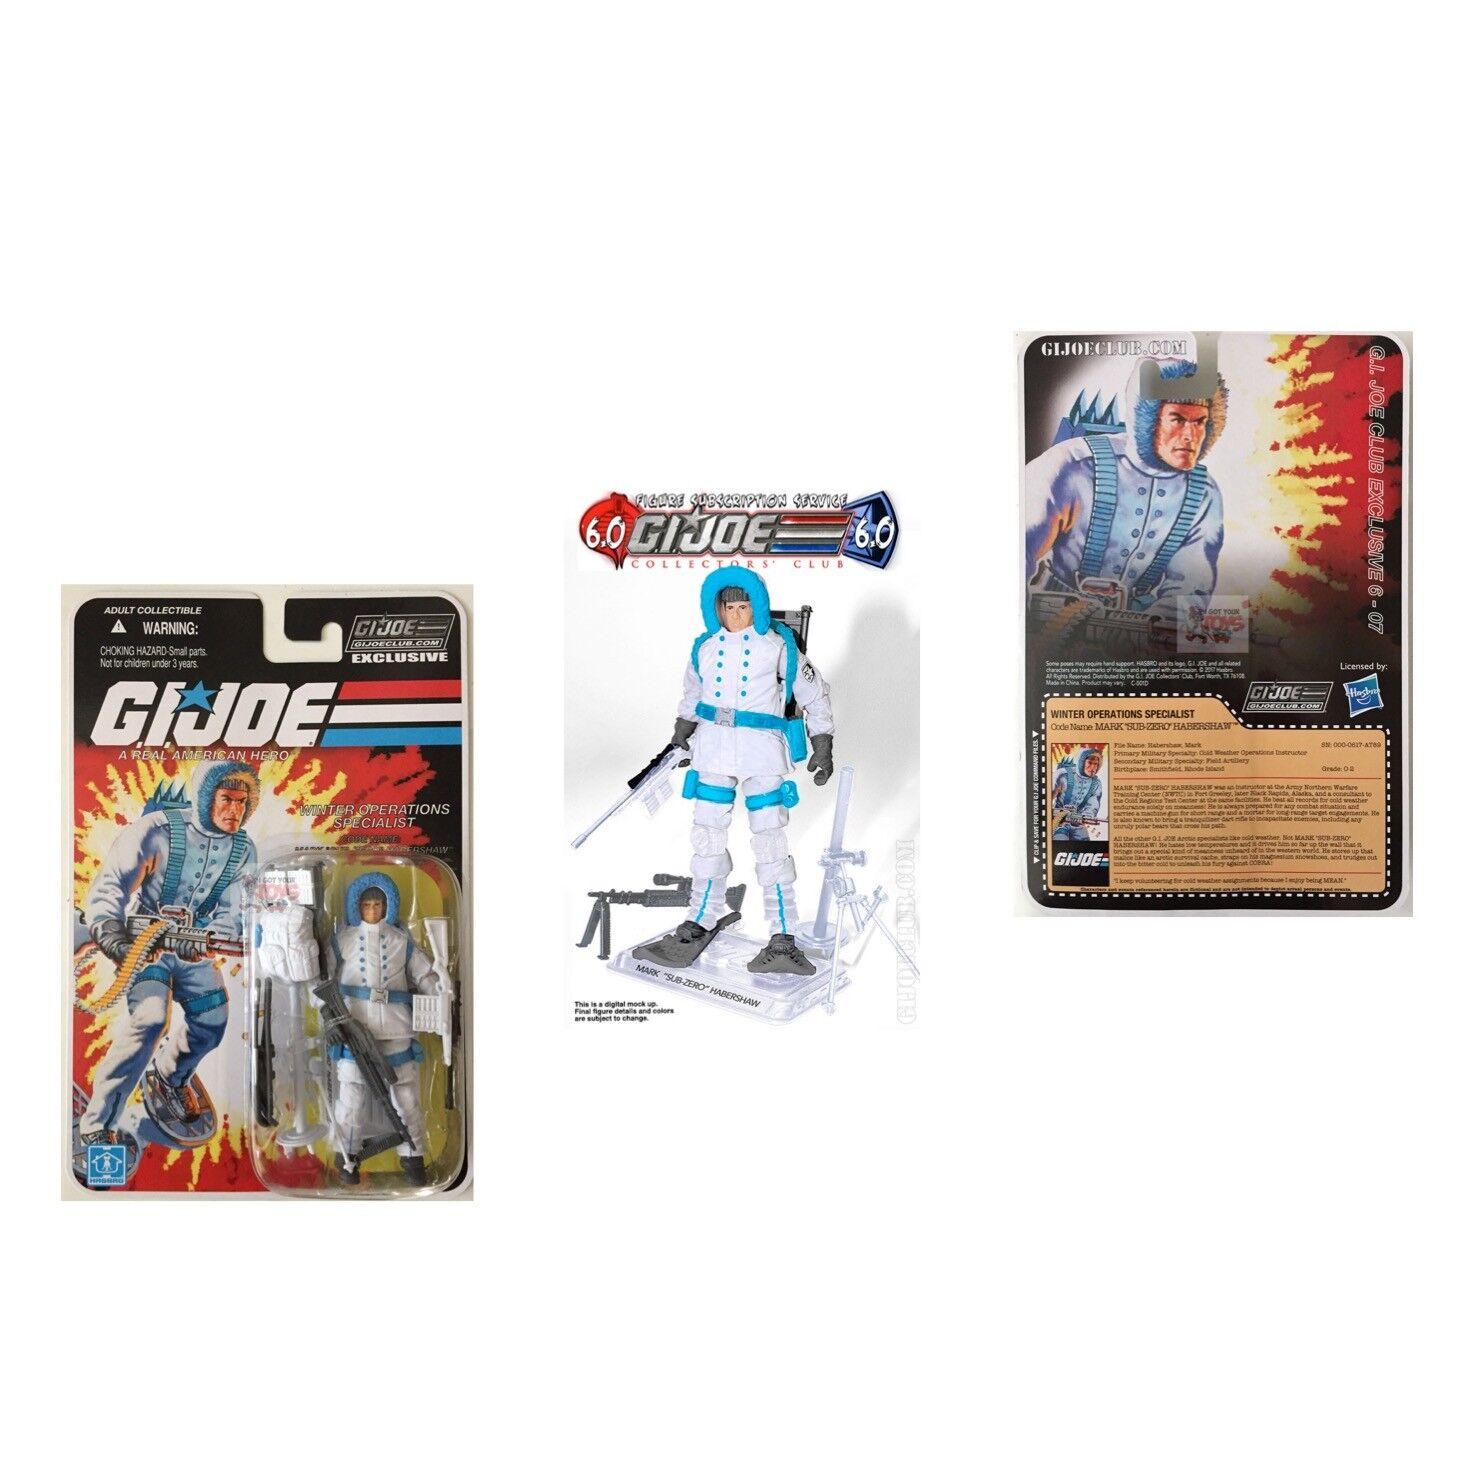 SUB ZERO FSS 6.0 Hasbro GI JOE Club Subscription 3.75